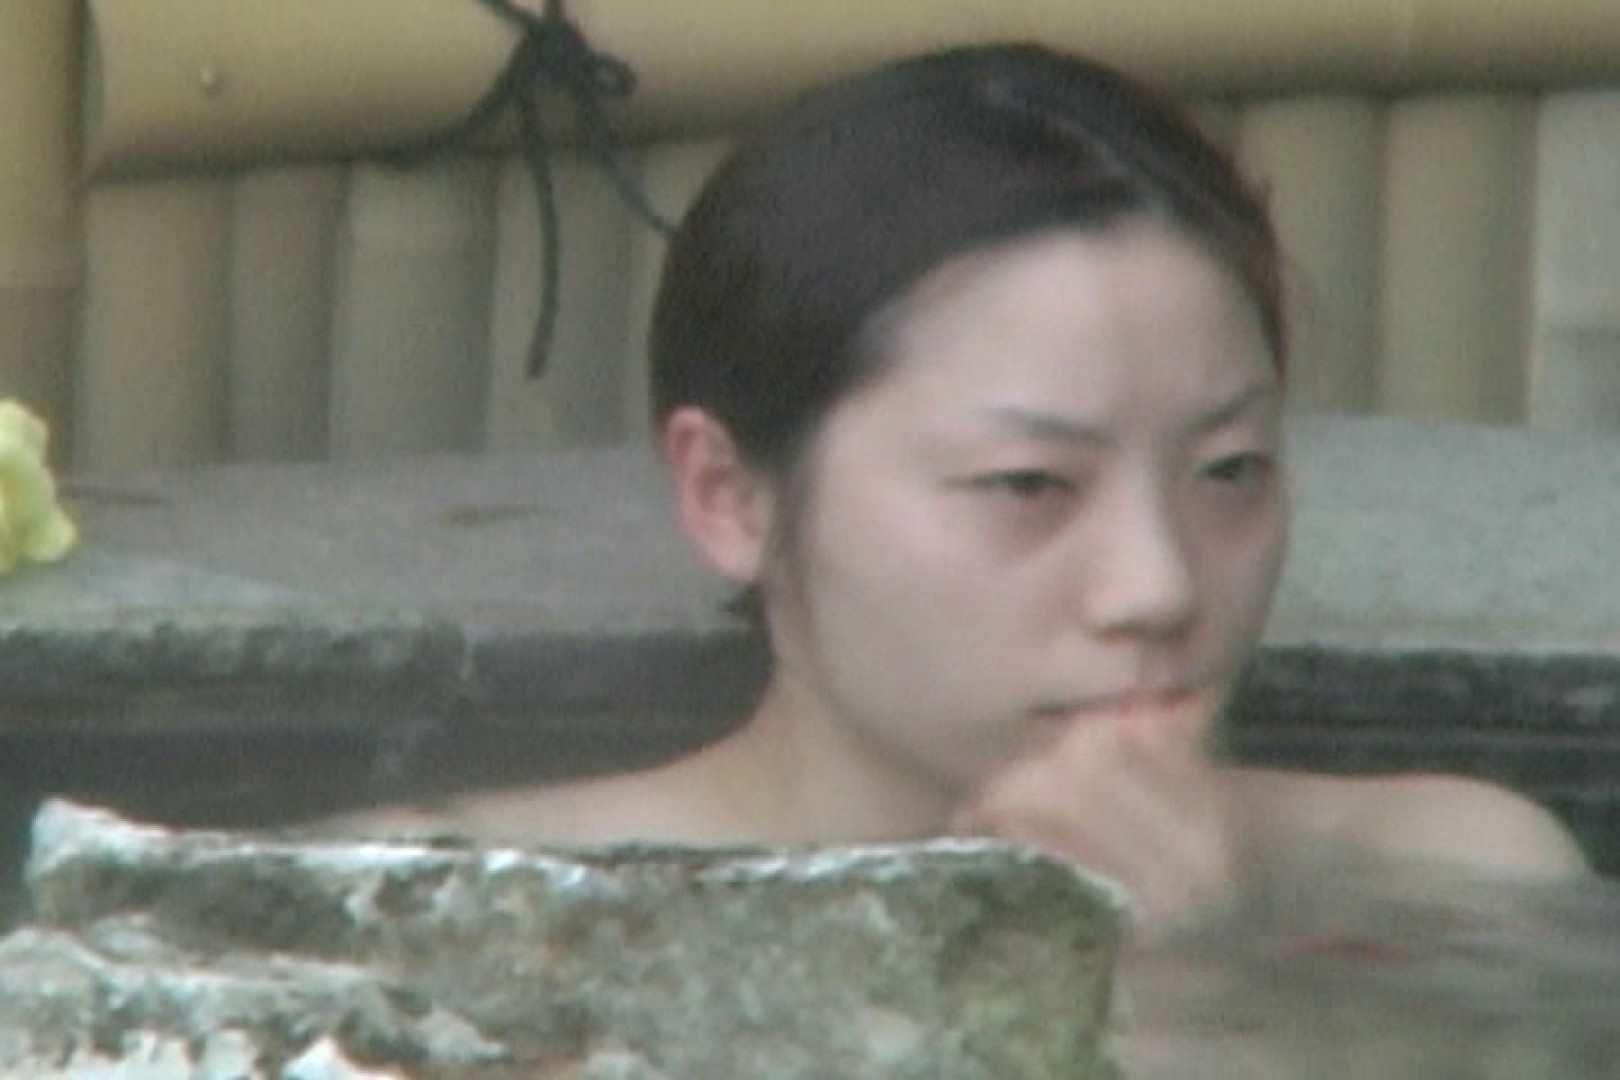 Aquaな露天風呂Vol.596 露天 覗きおまんこ画像 77画像 17